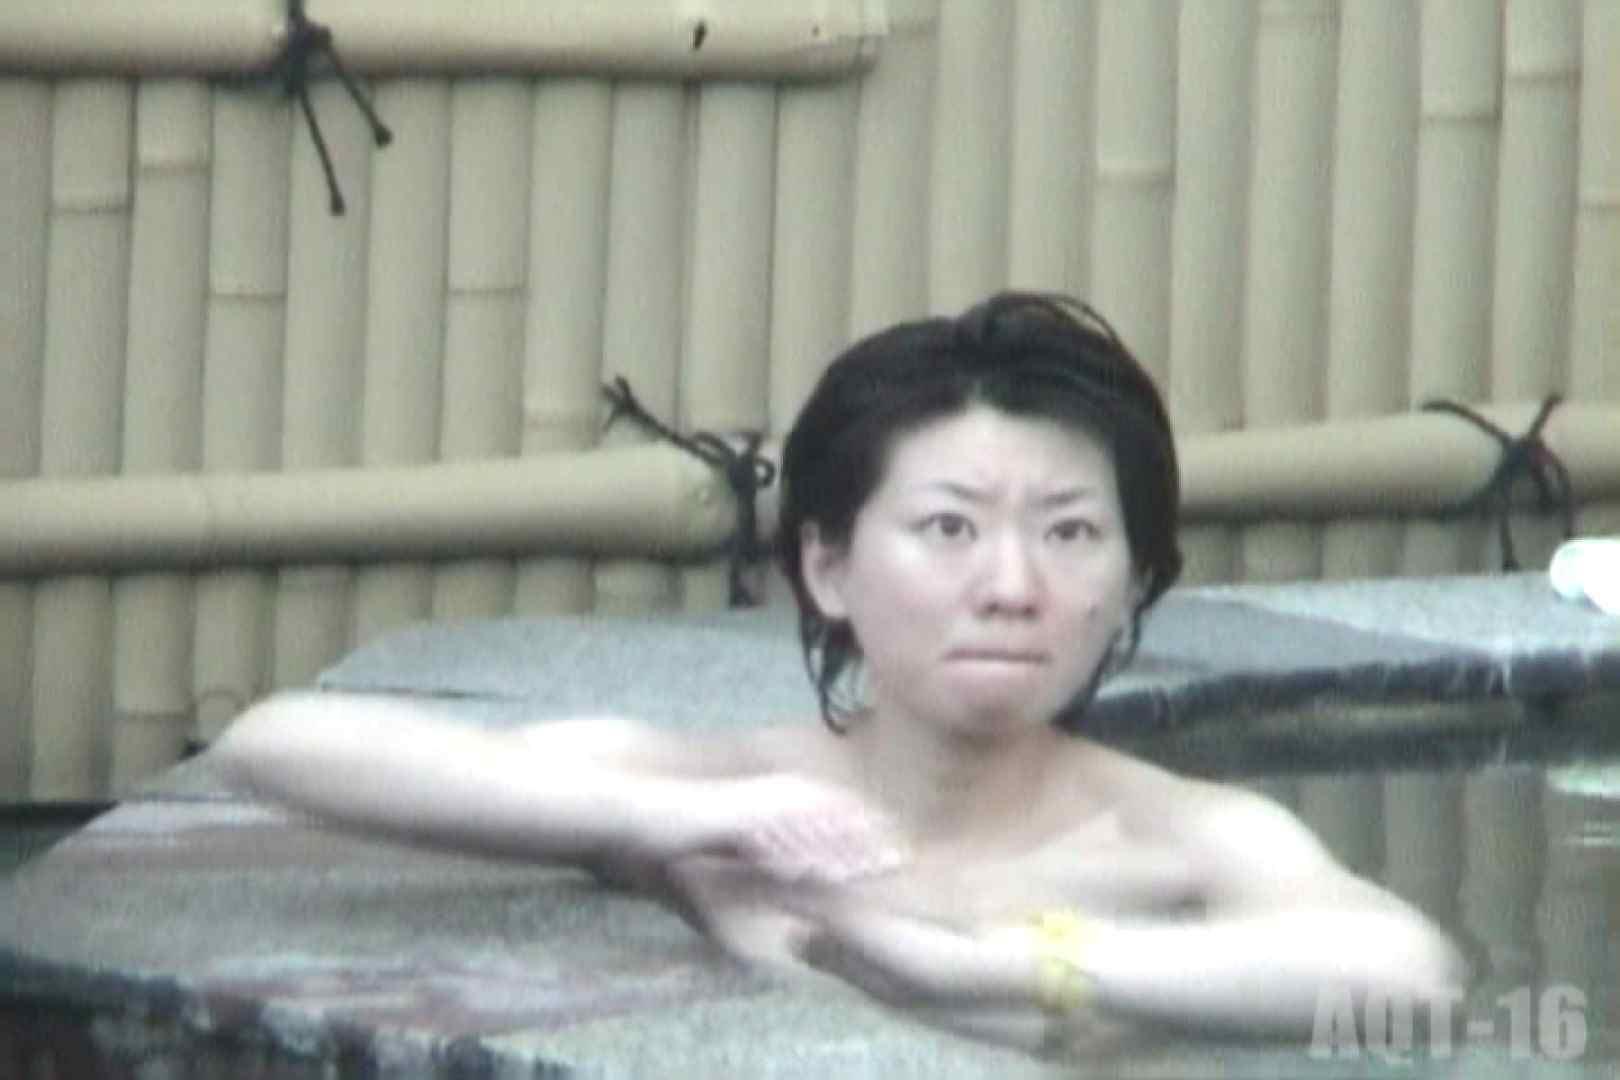 Aquaな露天風呂Vol.842 露天風呂編 | 盗撮シリーズ  82PIX 19